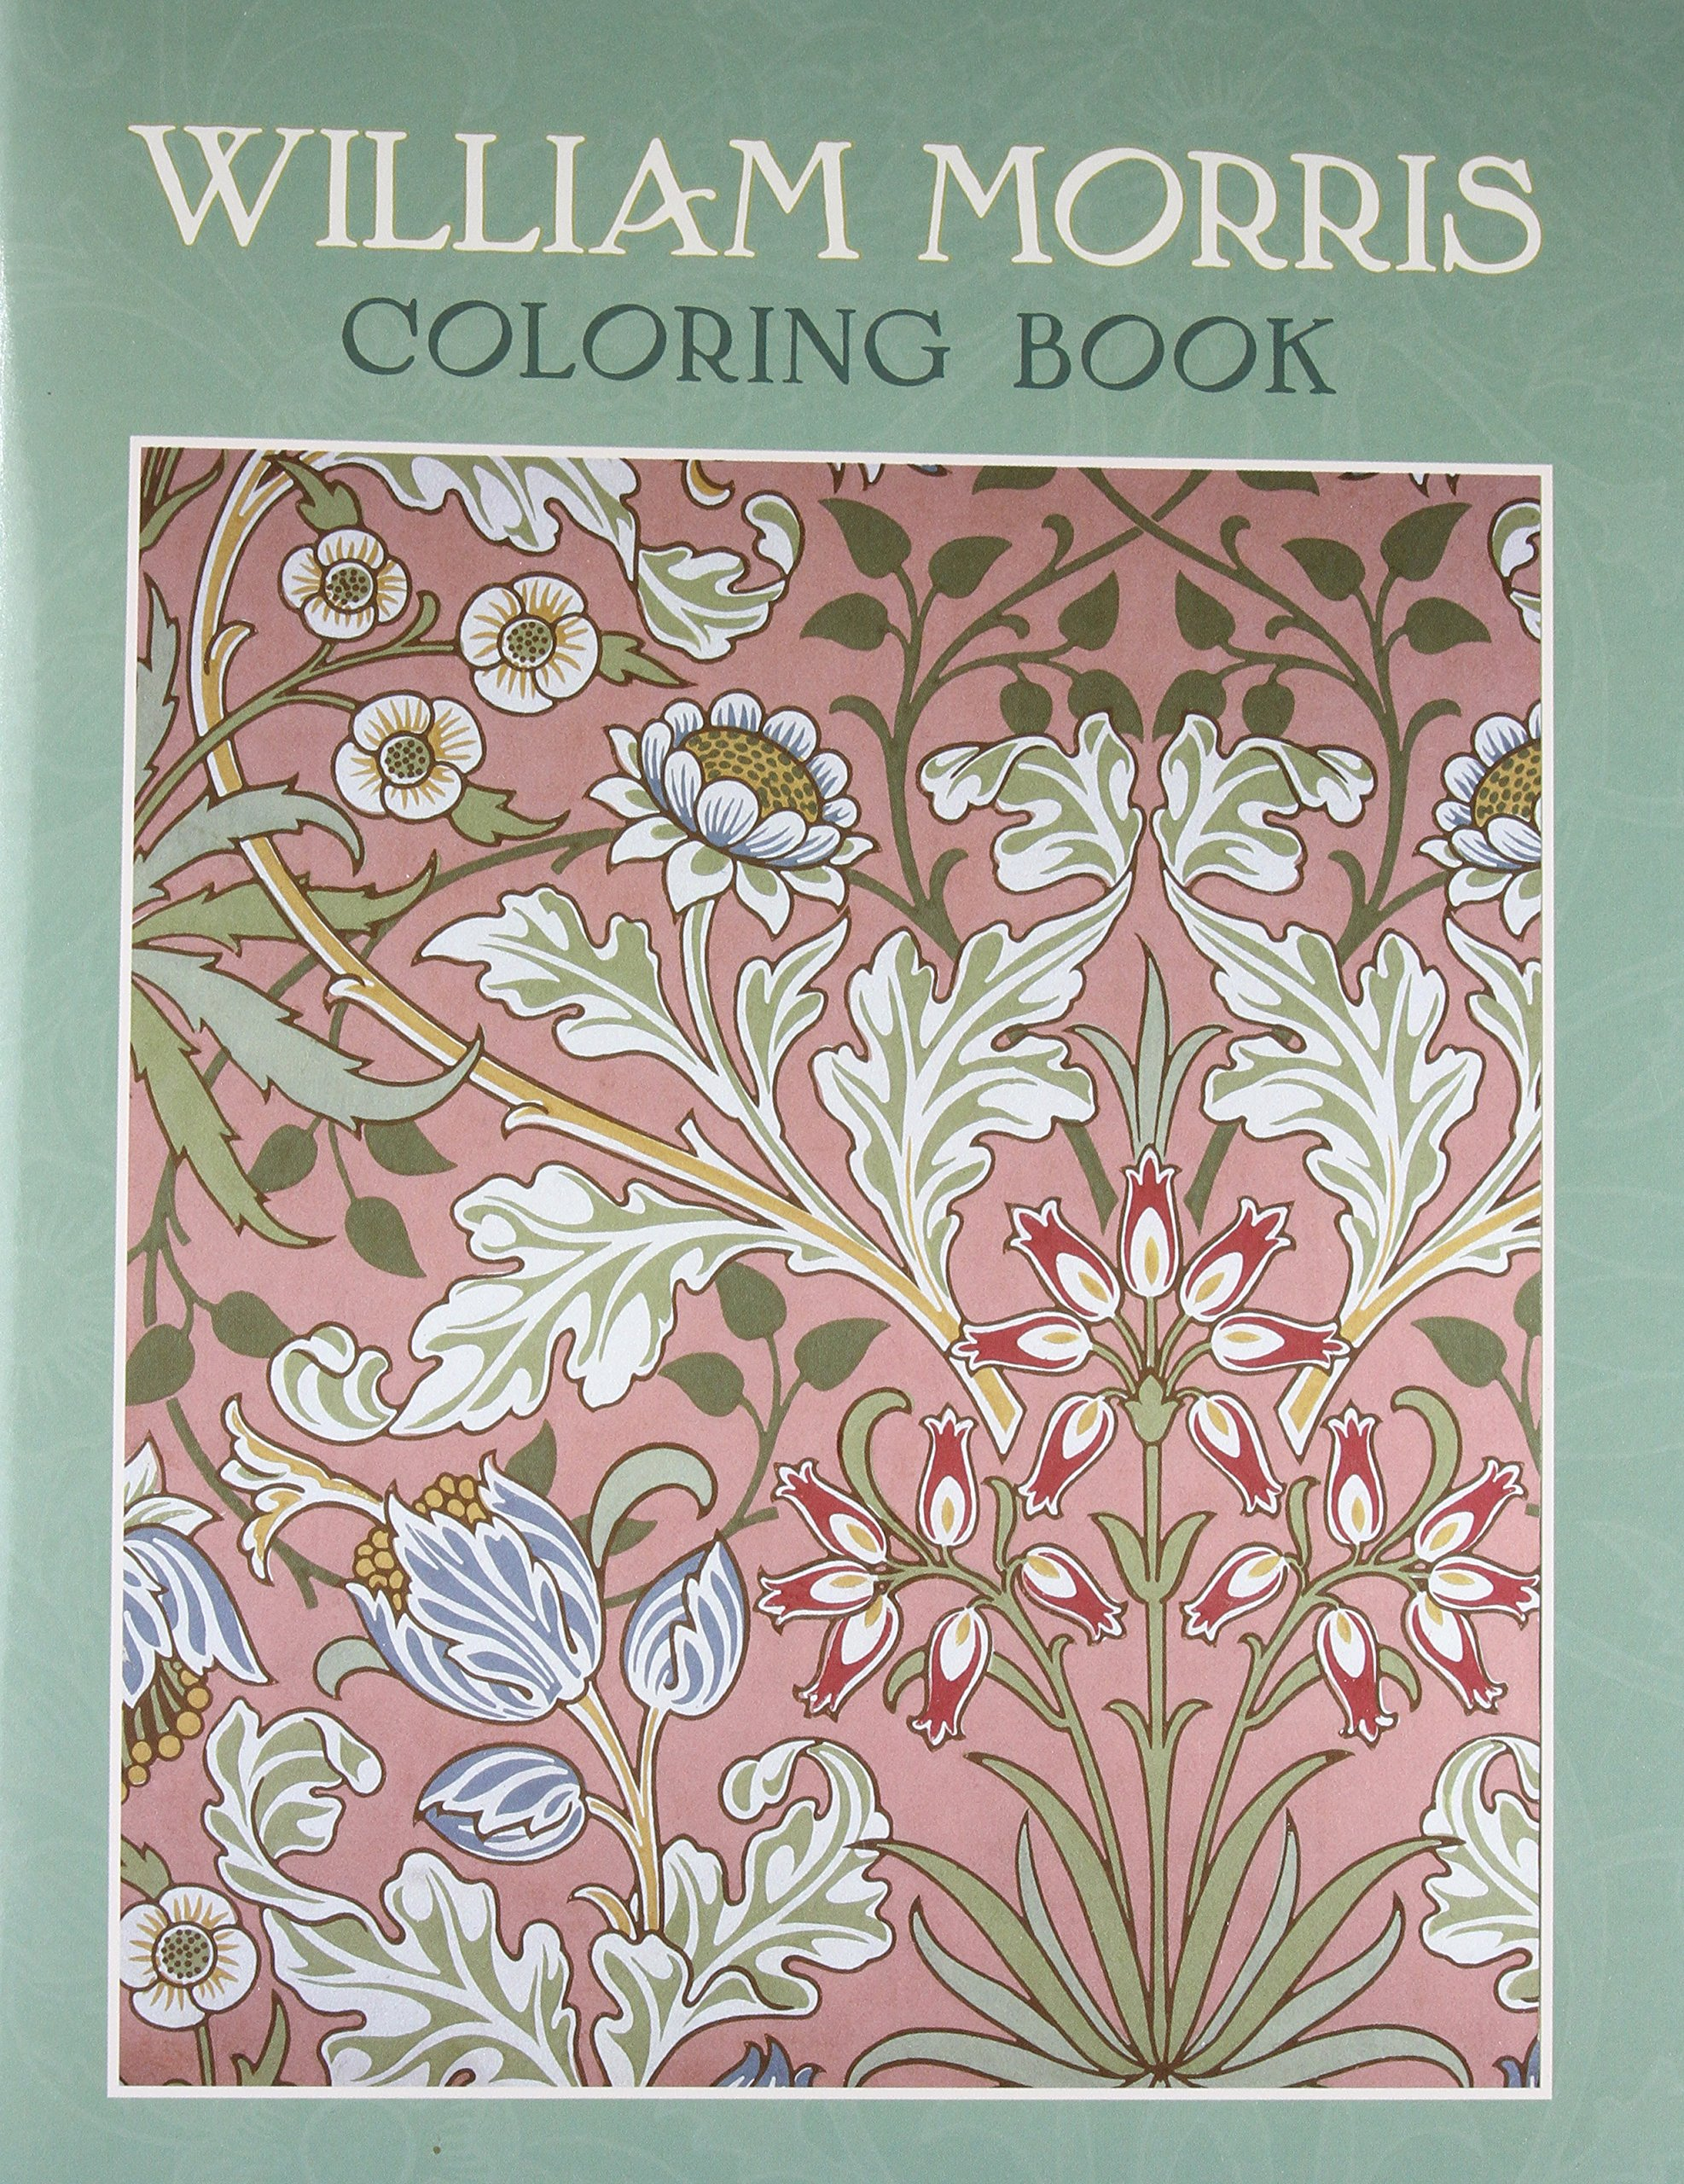 William Morris Coloring Book Brooklyn Museum Of Art 9780764950247 Amazon Com Books